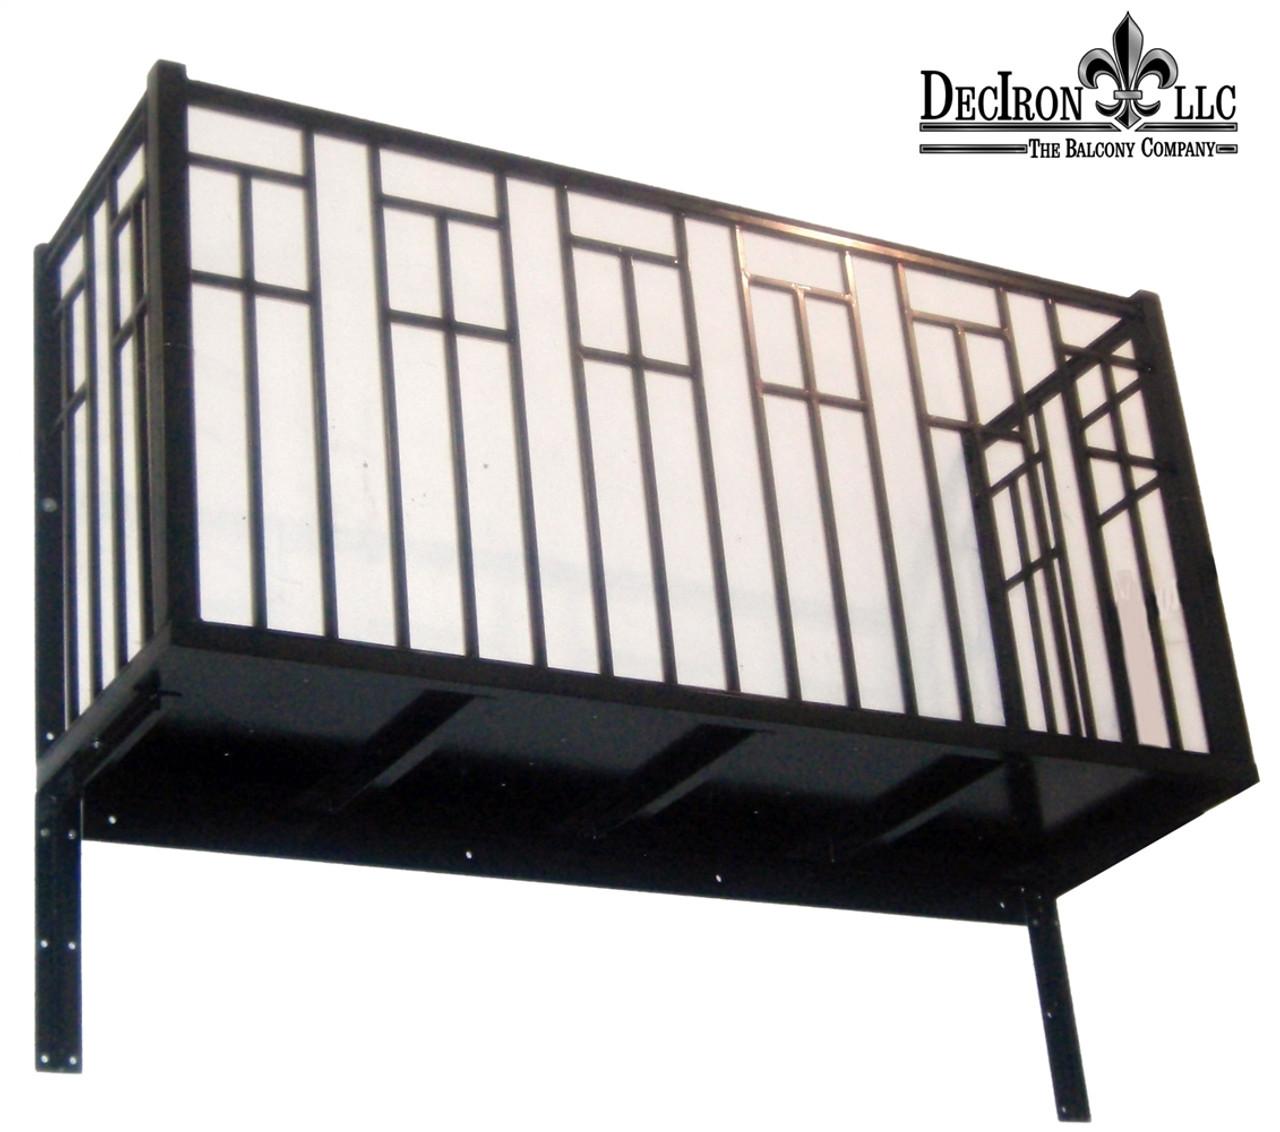 Contemporary design 1 2 pickets wrought iron balcony 42 for Balcony platform